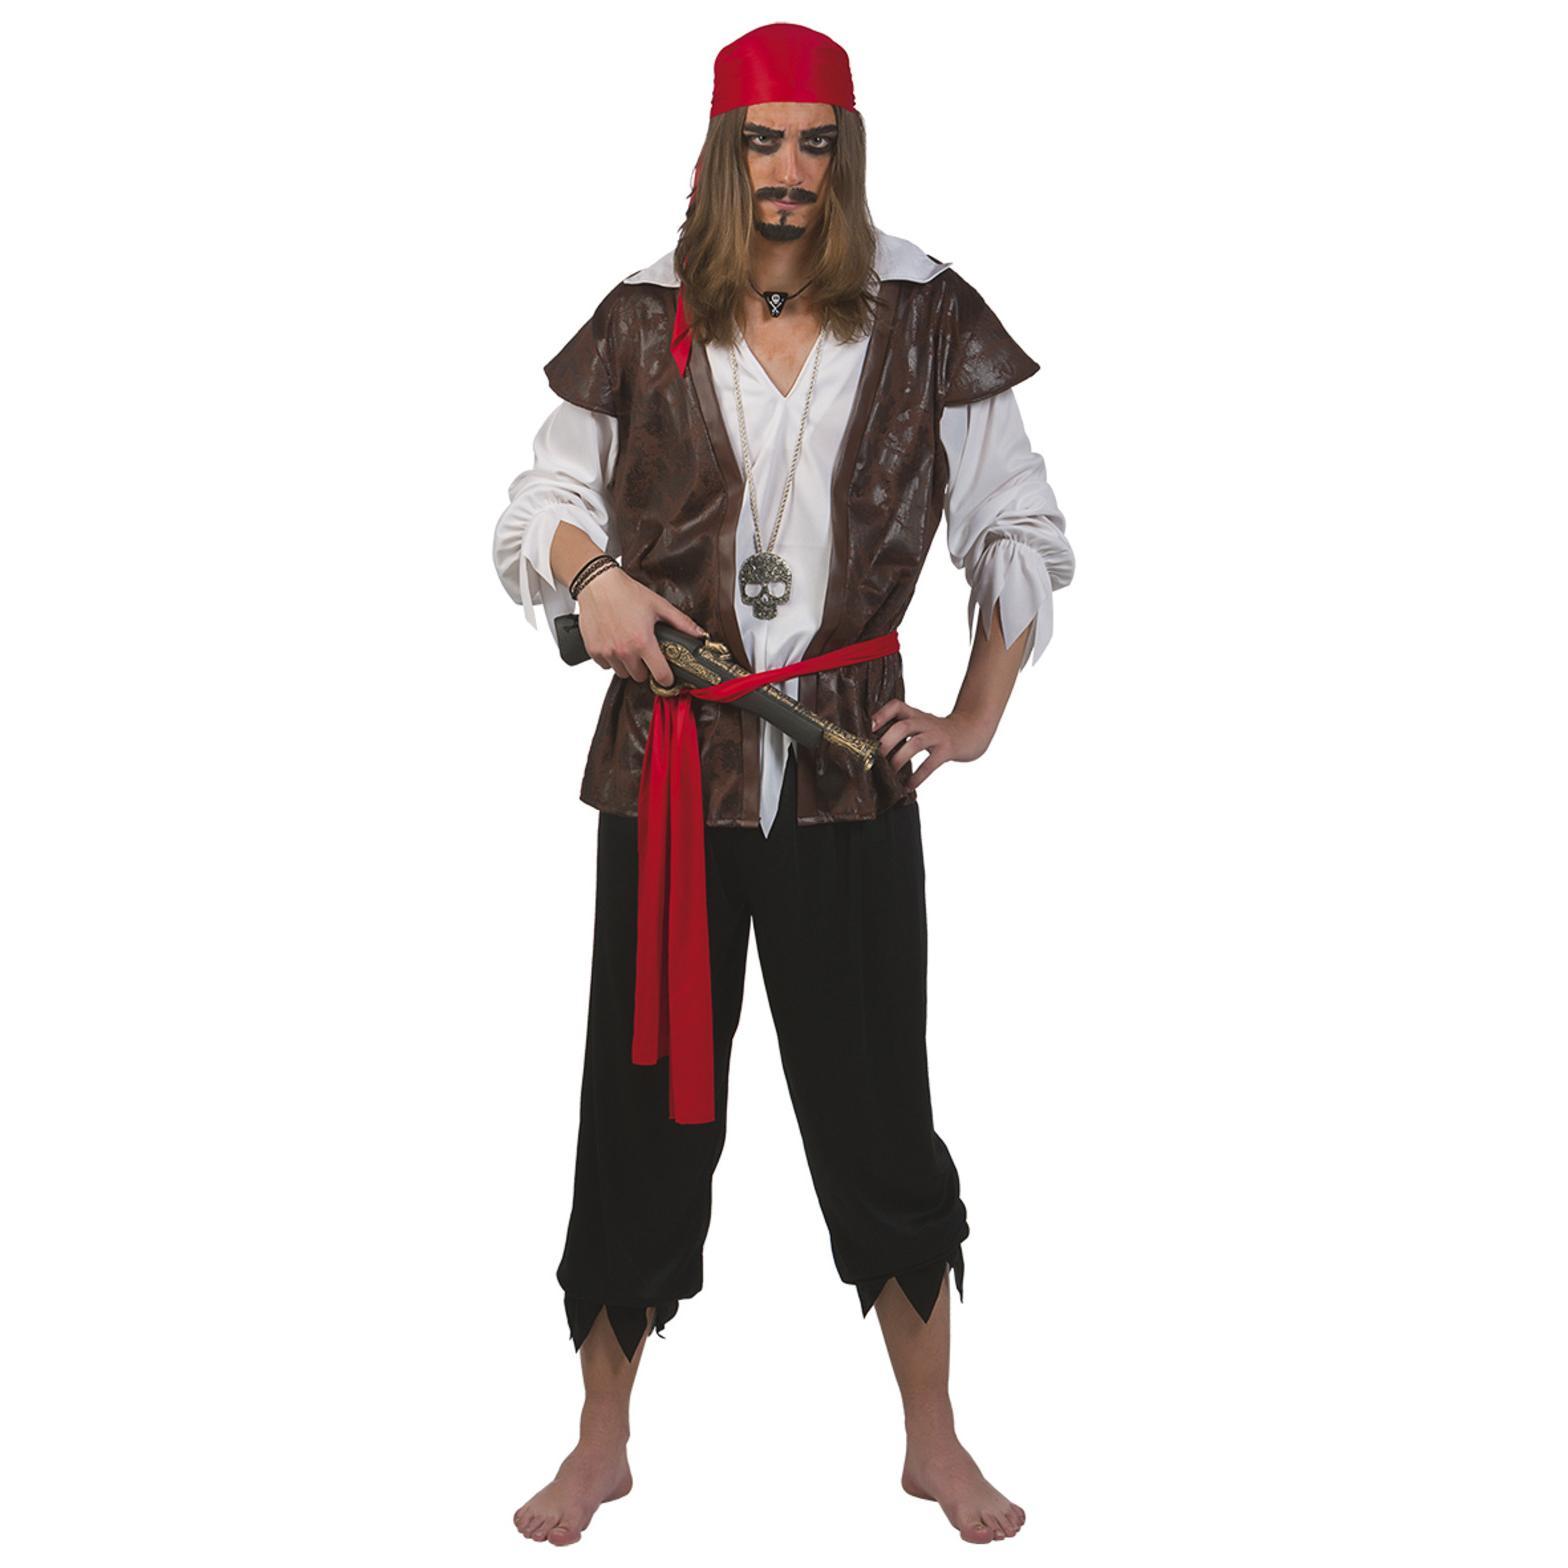 Pirat maskeraddräkt billigt online  6230ce9957022